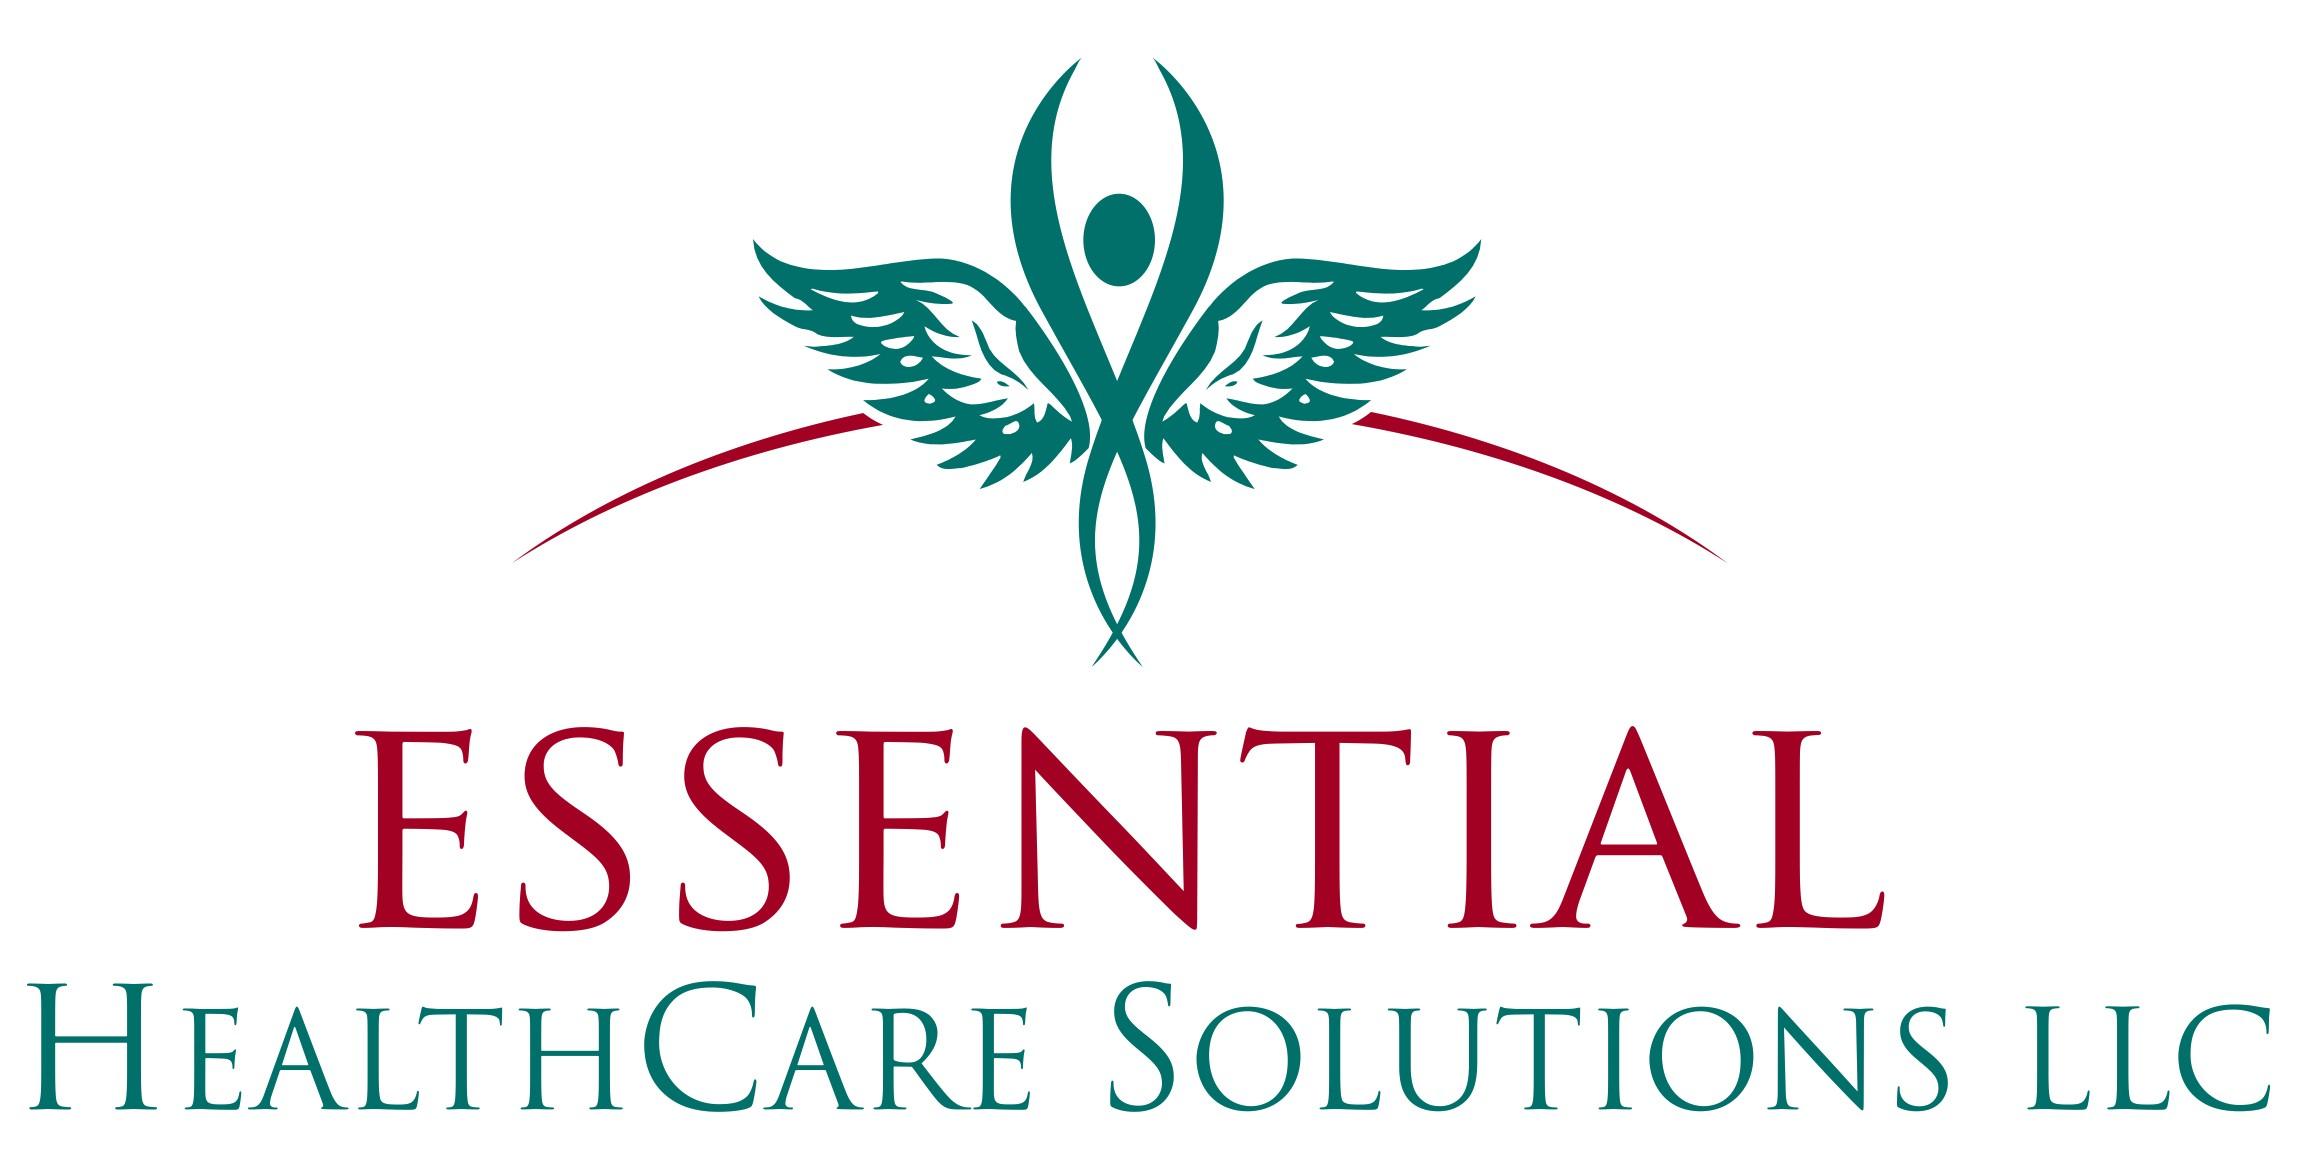 Essential HealthCare Solutions, LLC | LinkedIn